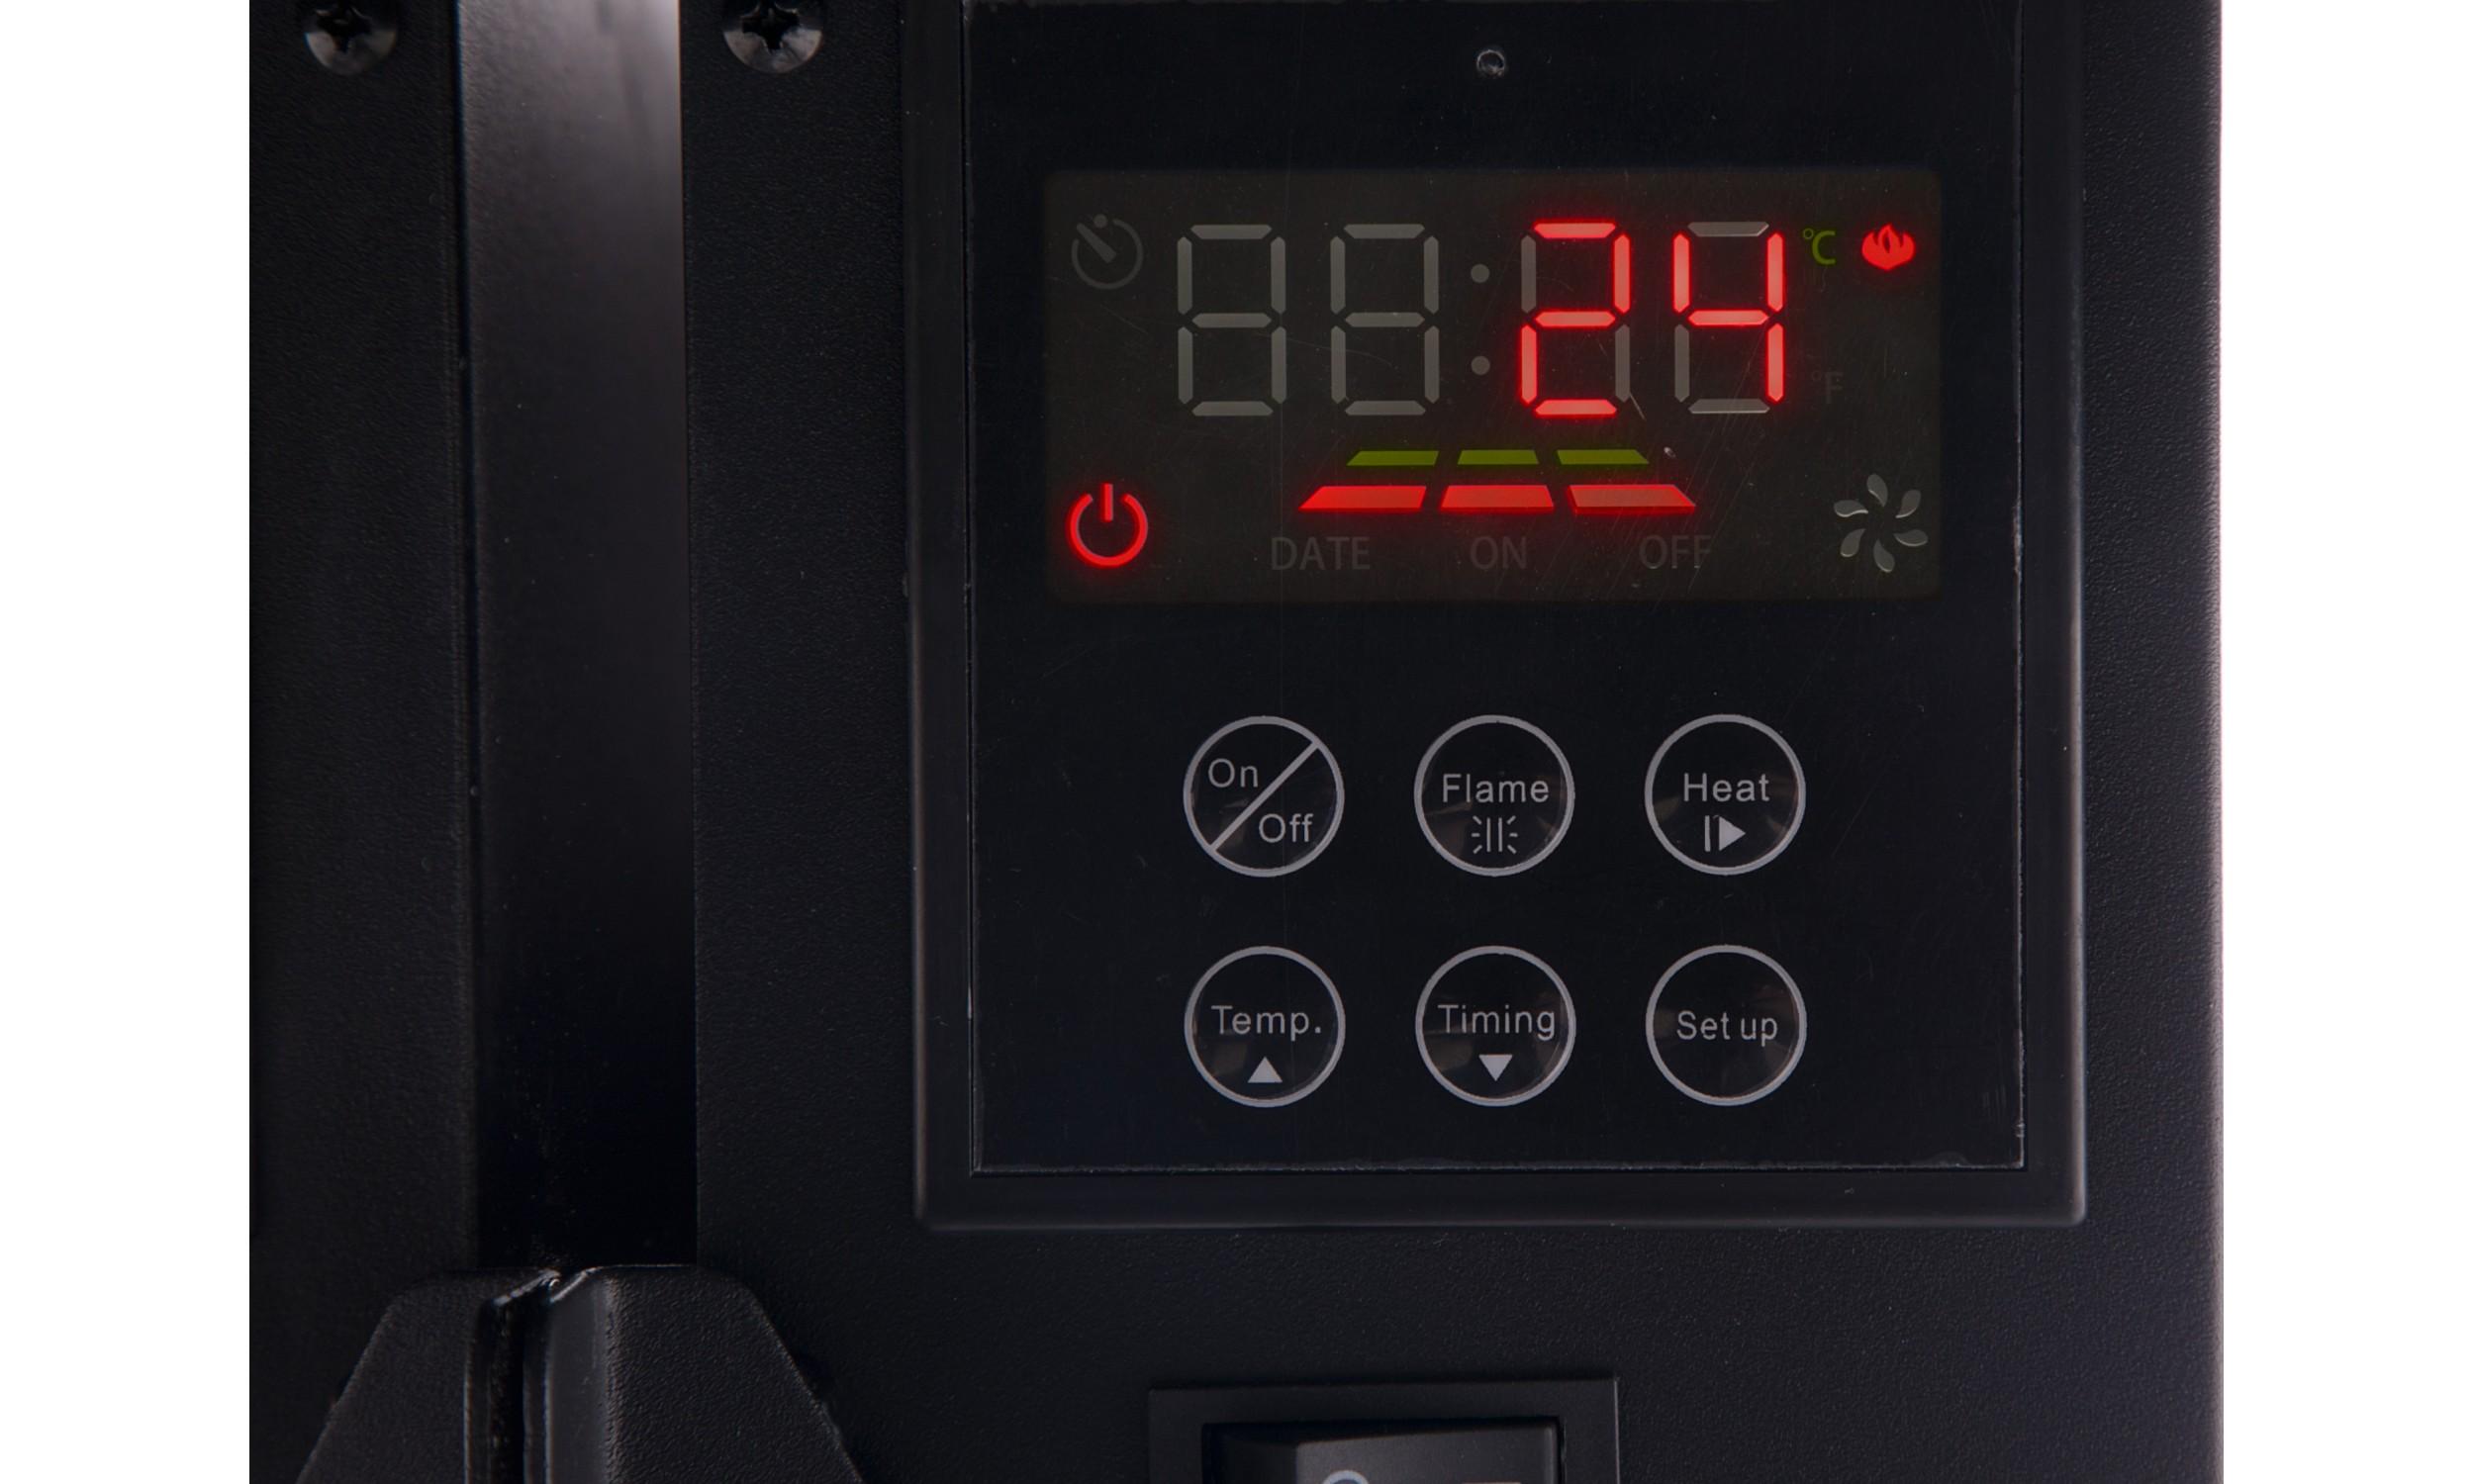 Chimenea Eléctrica CHE-450 (Espejo) de